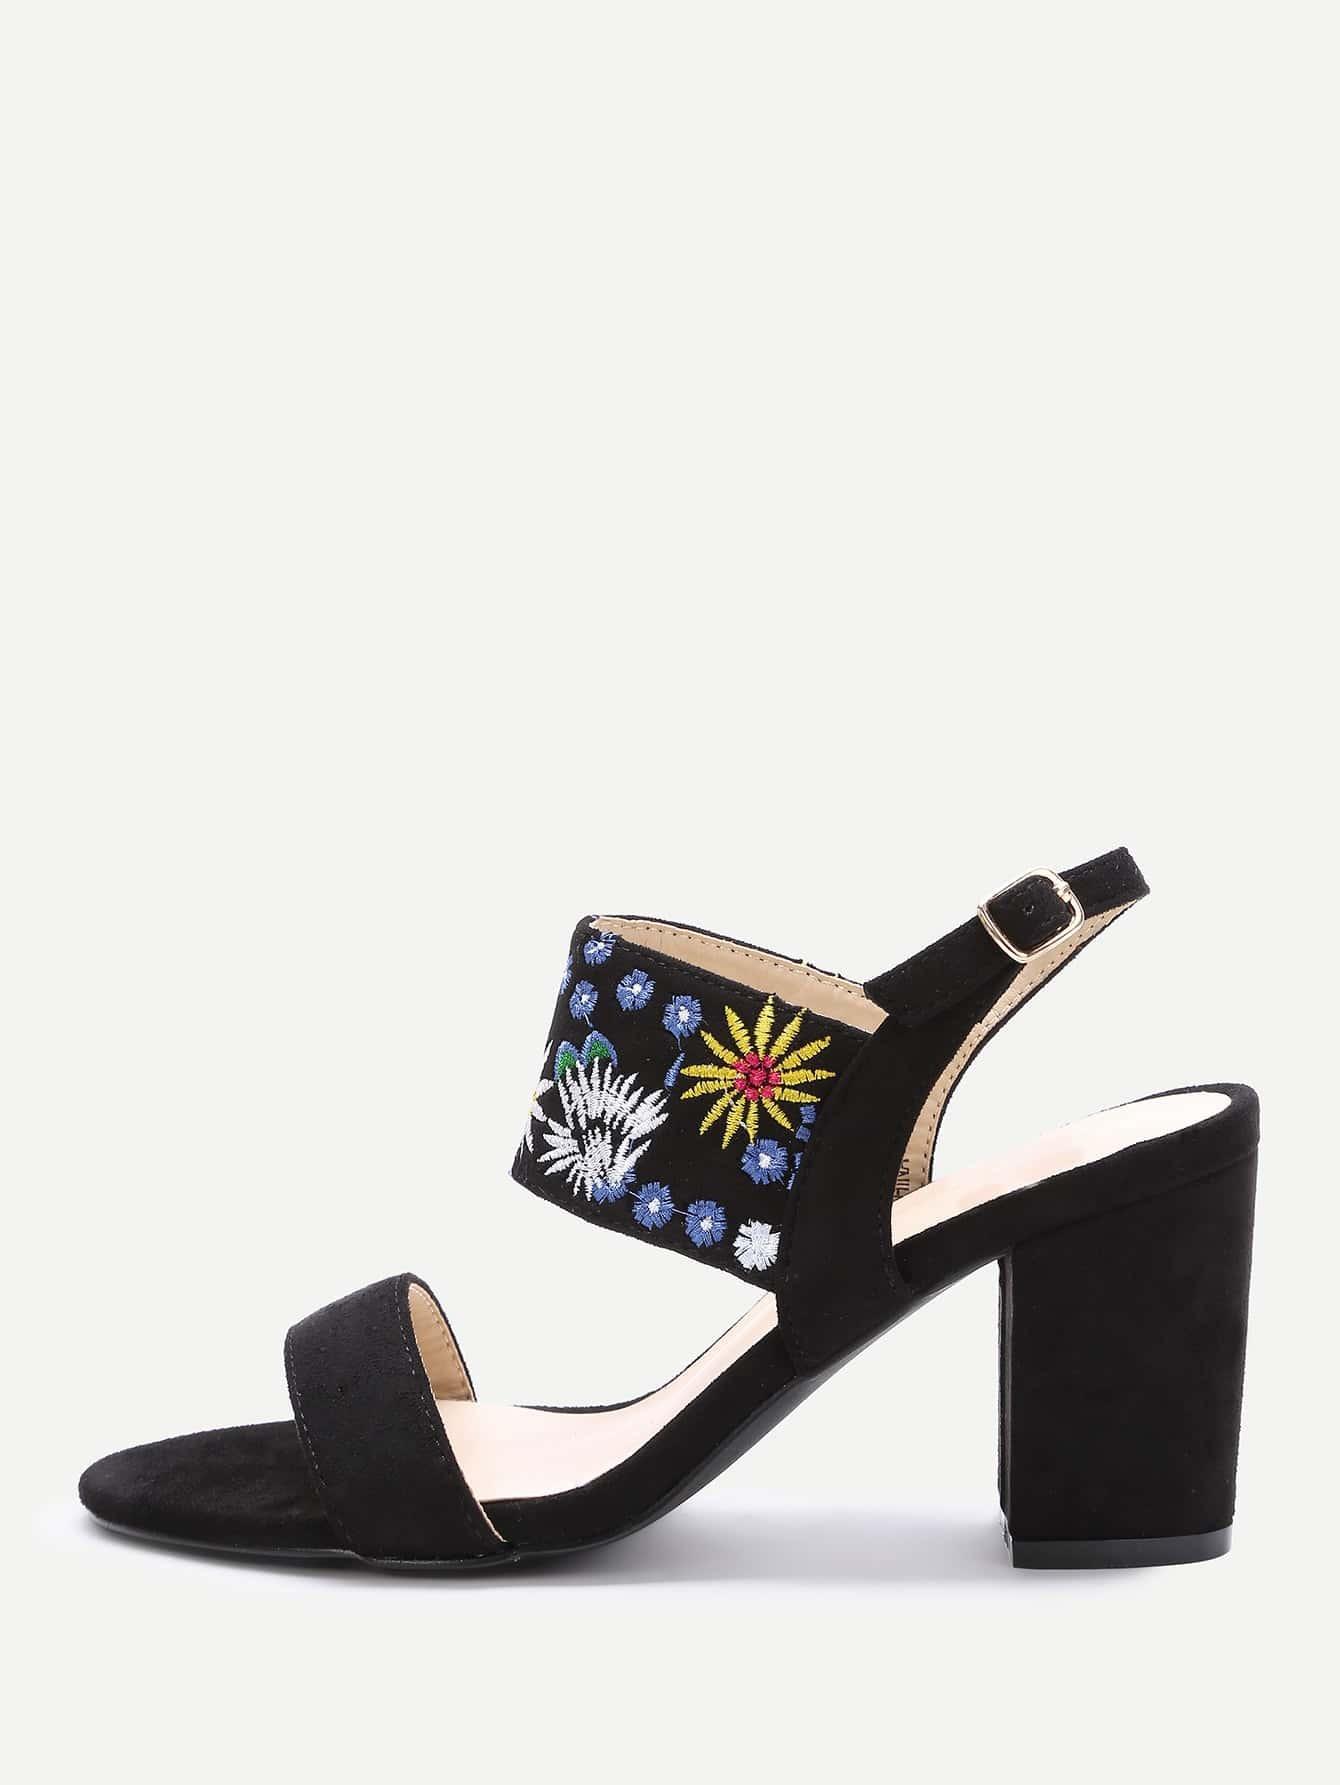 Фото Black Embroidery Strap Chunky Heeled Sandals. Купить с доставкой